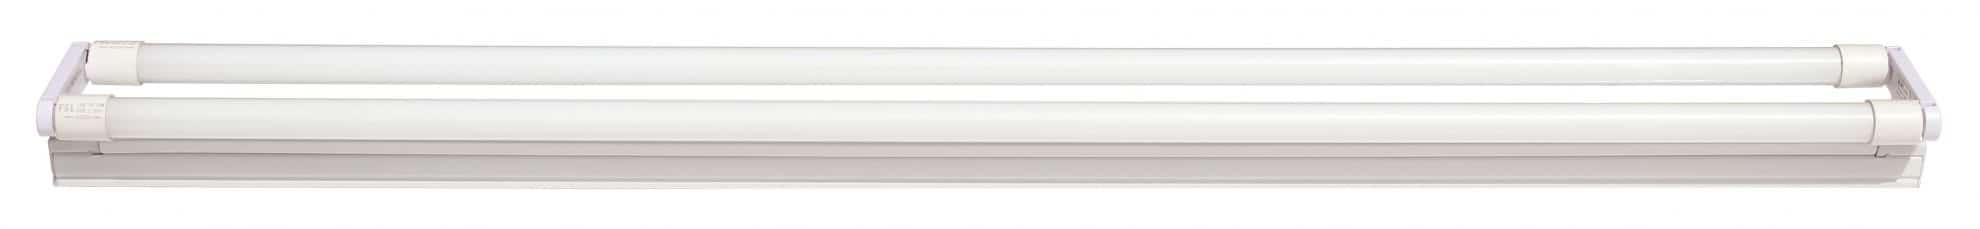 תאורת לד אמריקאי (פלורסנט) לבן PS-T8LG 2X22W-D , FSL